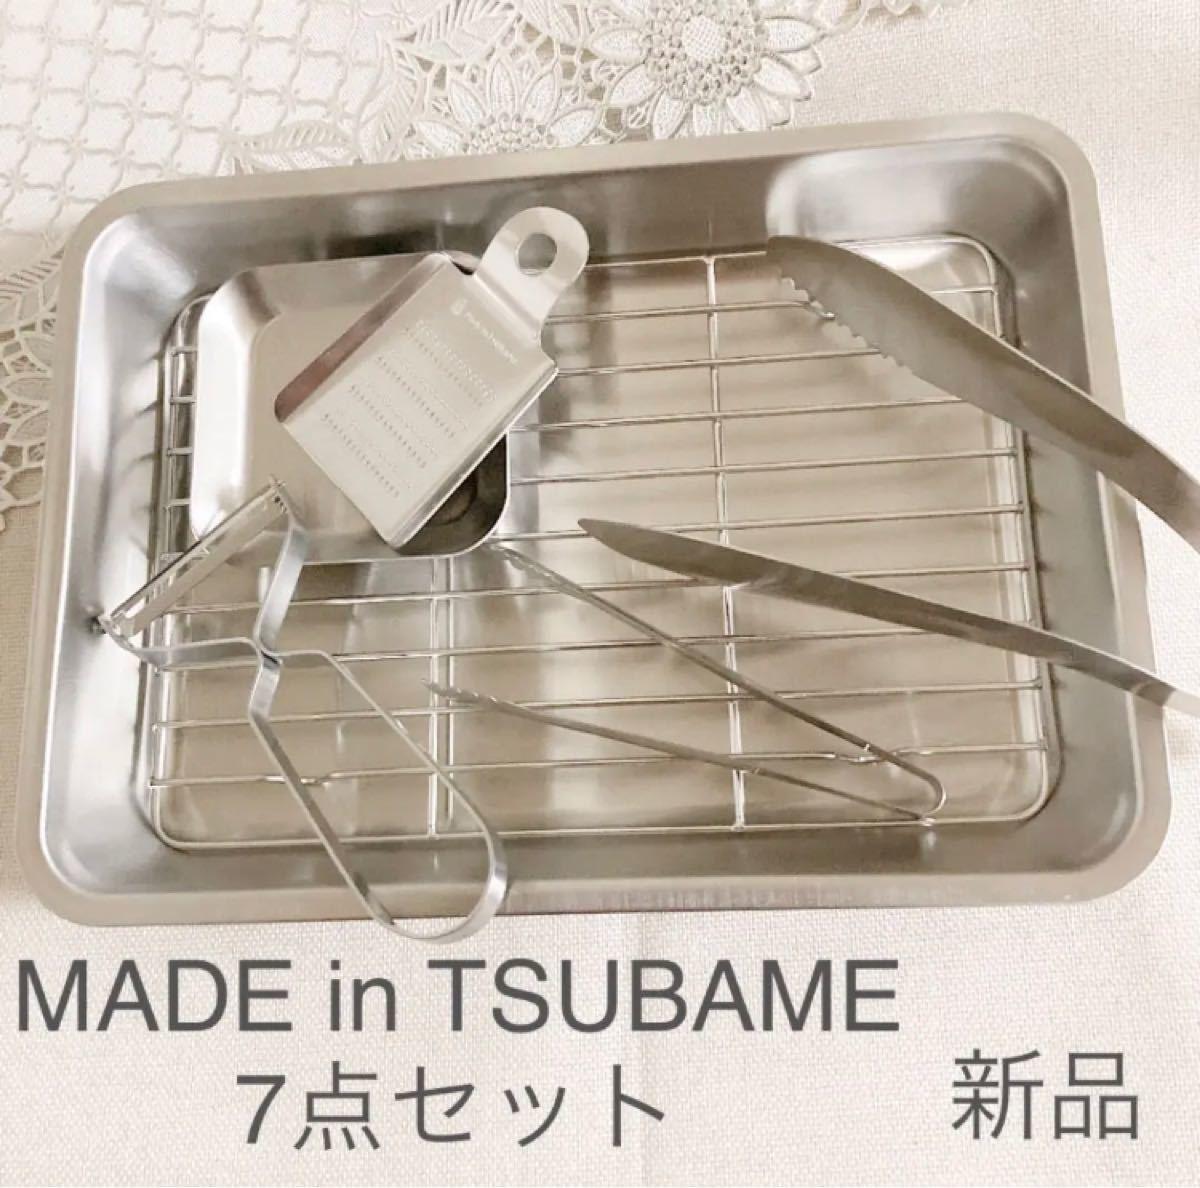 MADE in TSUBAME 下ごしらえ7点セット 網付きバット トング おろし金 ピーラー 薬味小皿 ミニトング 新品 燕三条